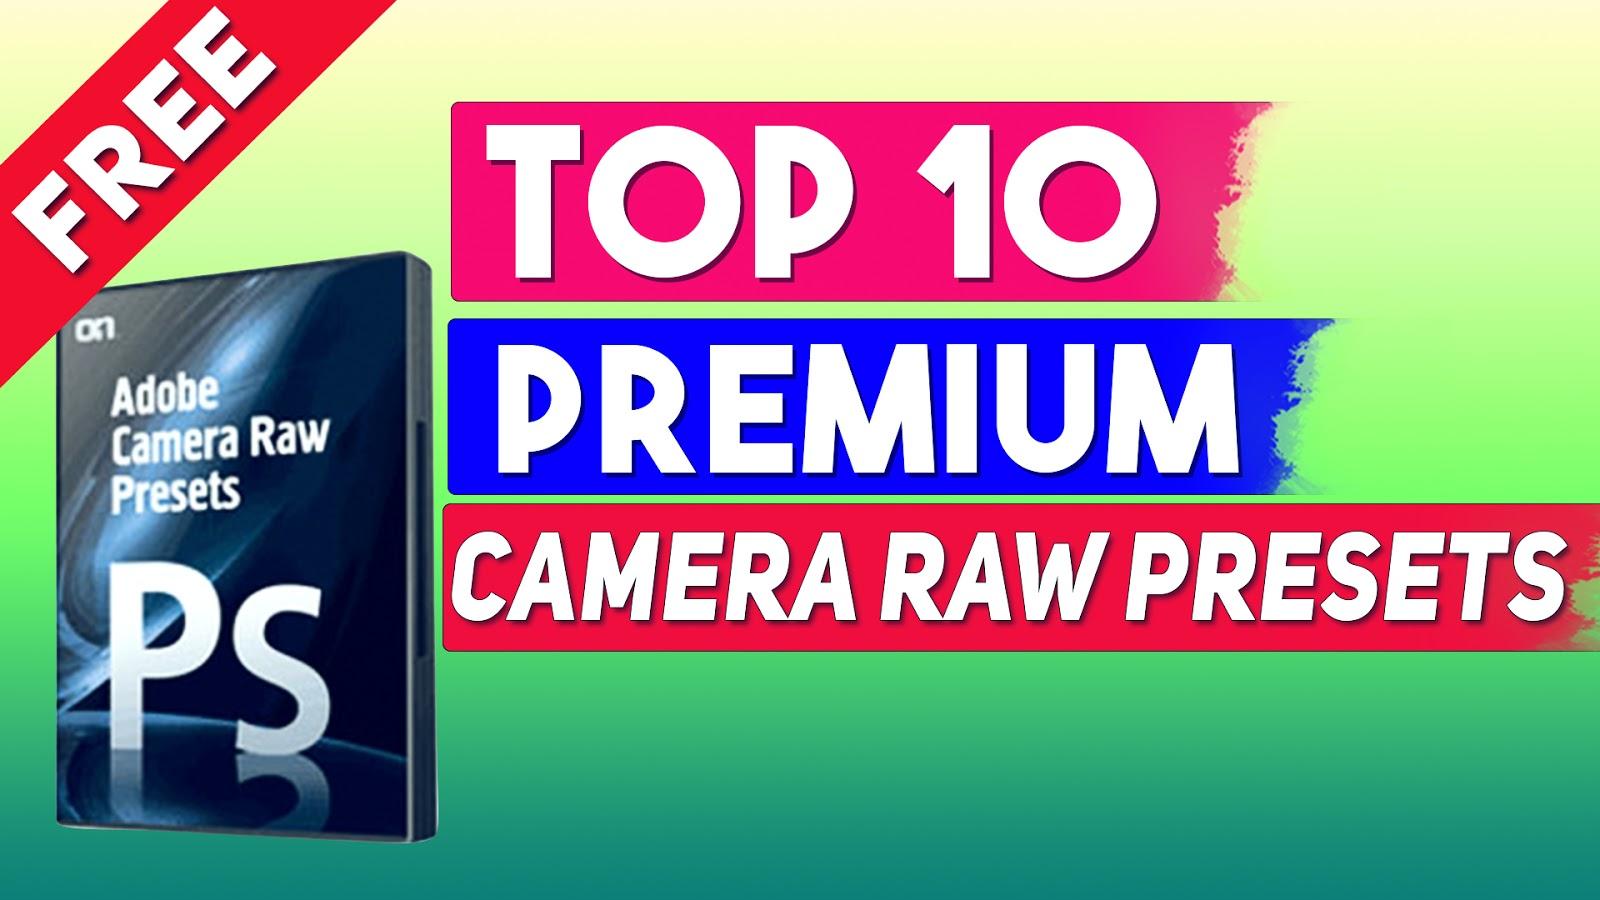 Top-10 Premium Adobe Camera Raw Presets Free Download